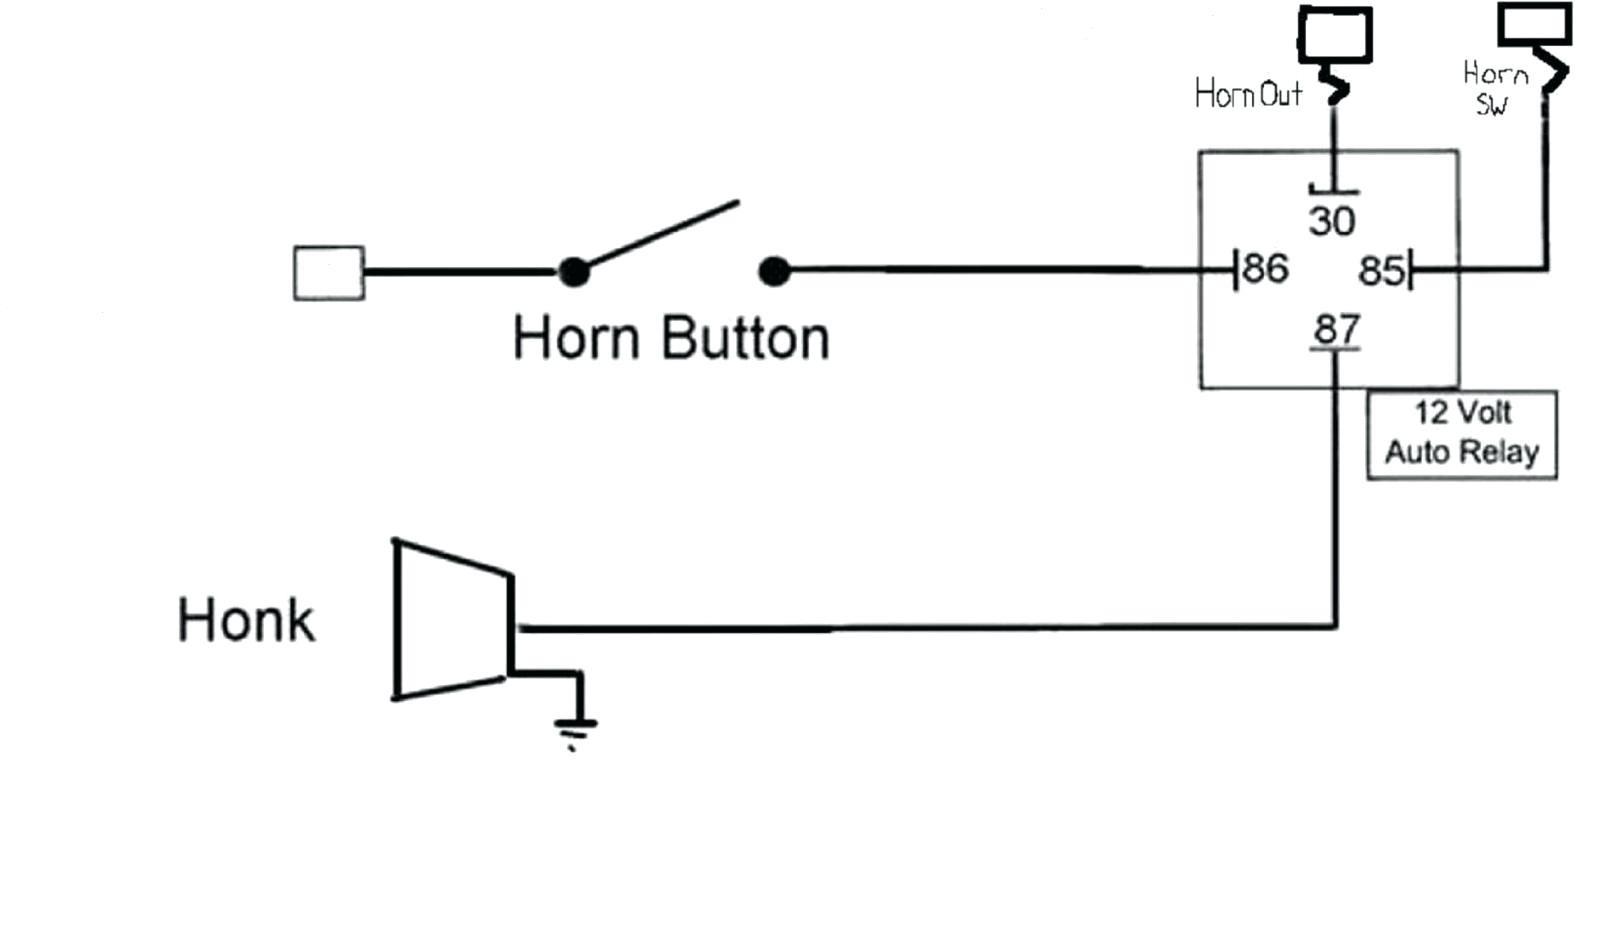 Wiring Car Horn Diagram - Wiring Diagram Data - Horn Relay Wiring Diagram